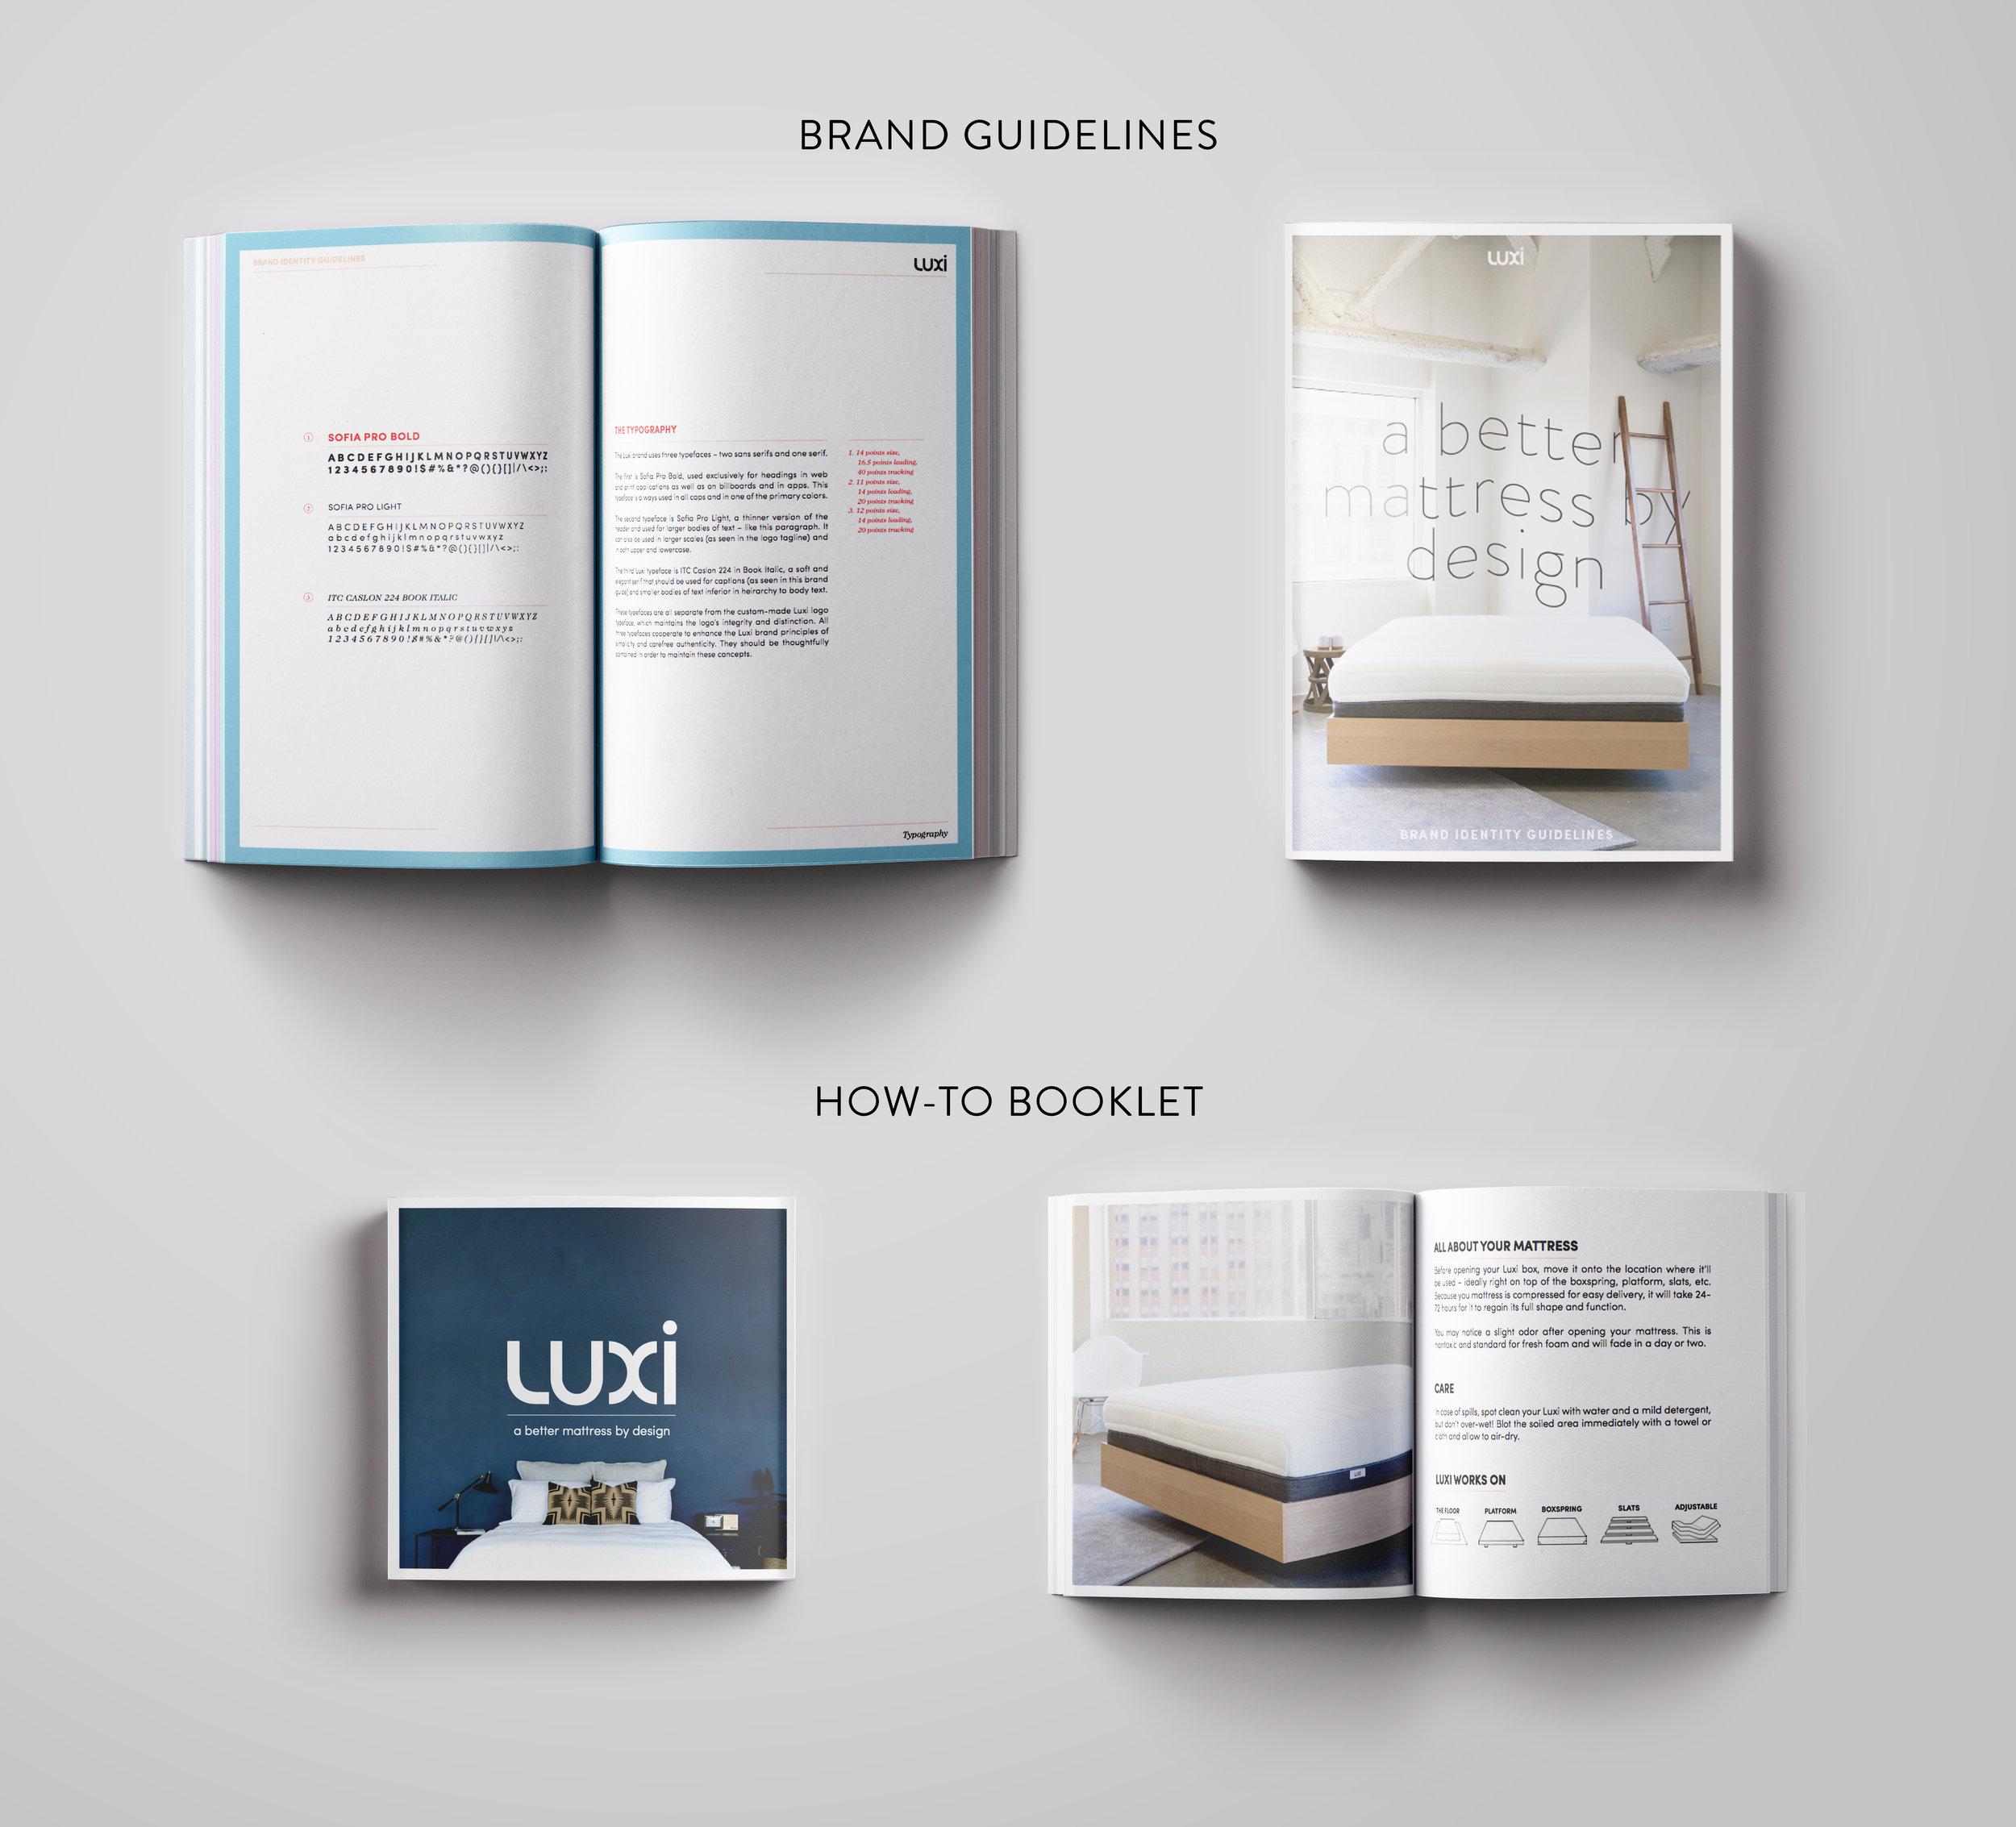 LUXI-BOOKs.jpg